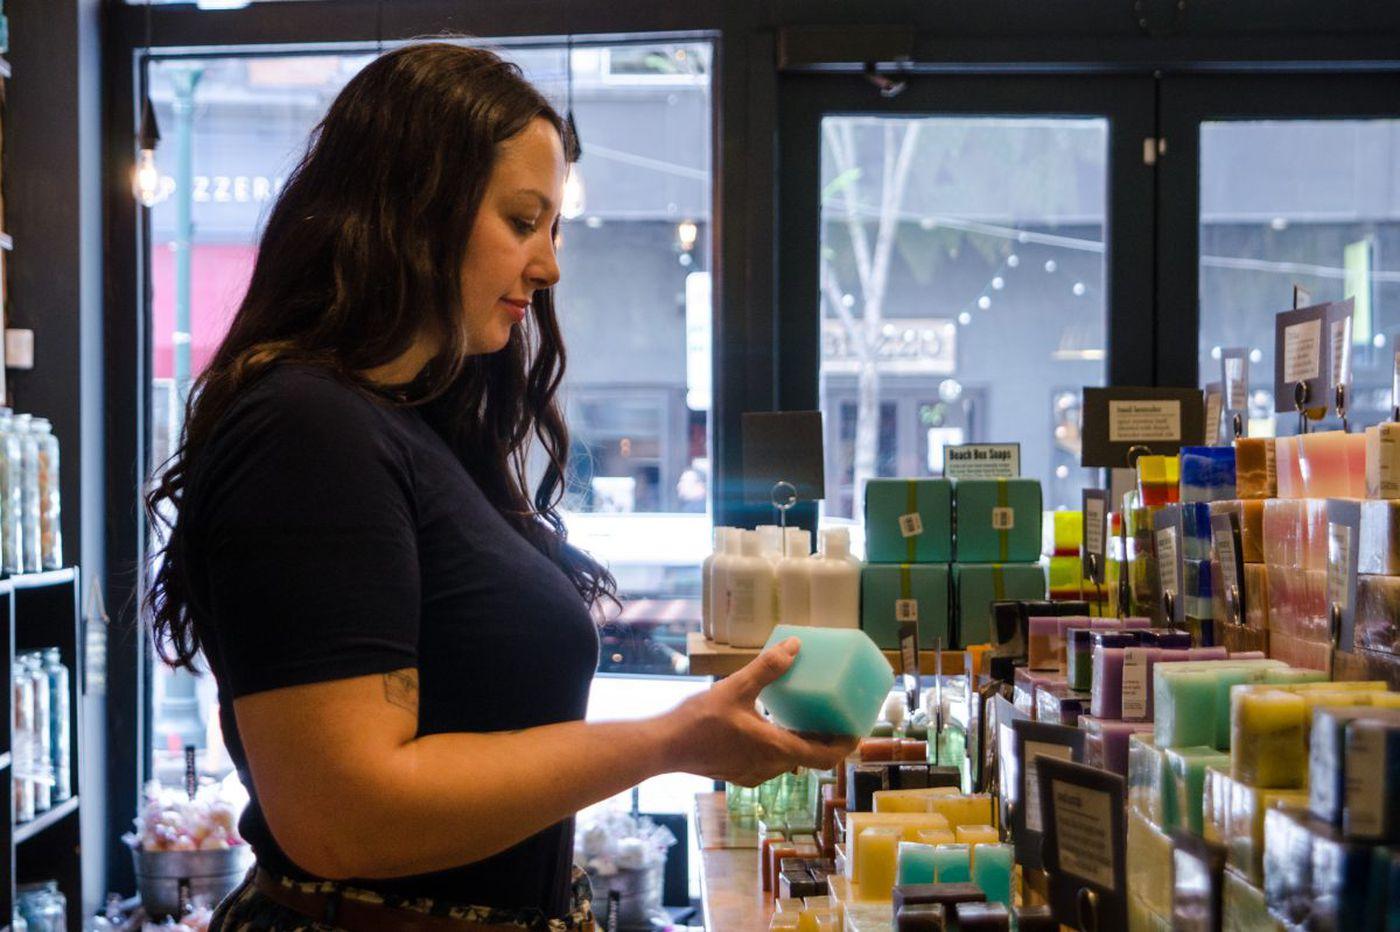 Bar soaps get love from millennials raised on the liquid stuff